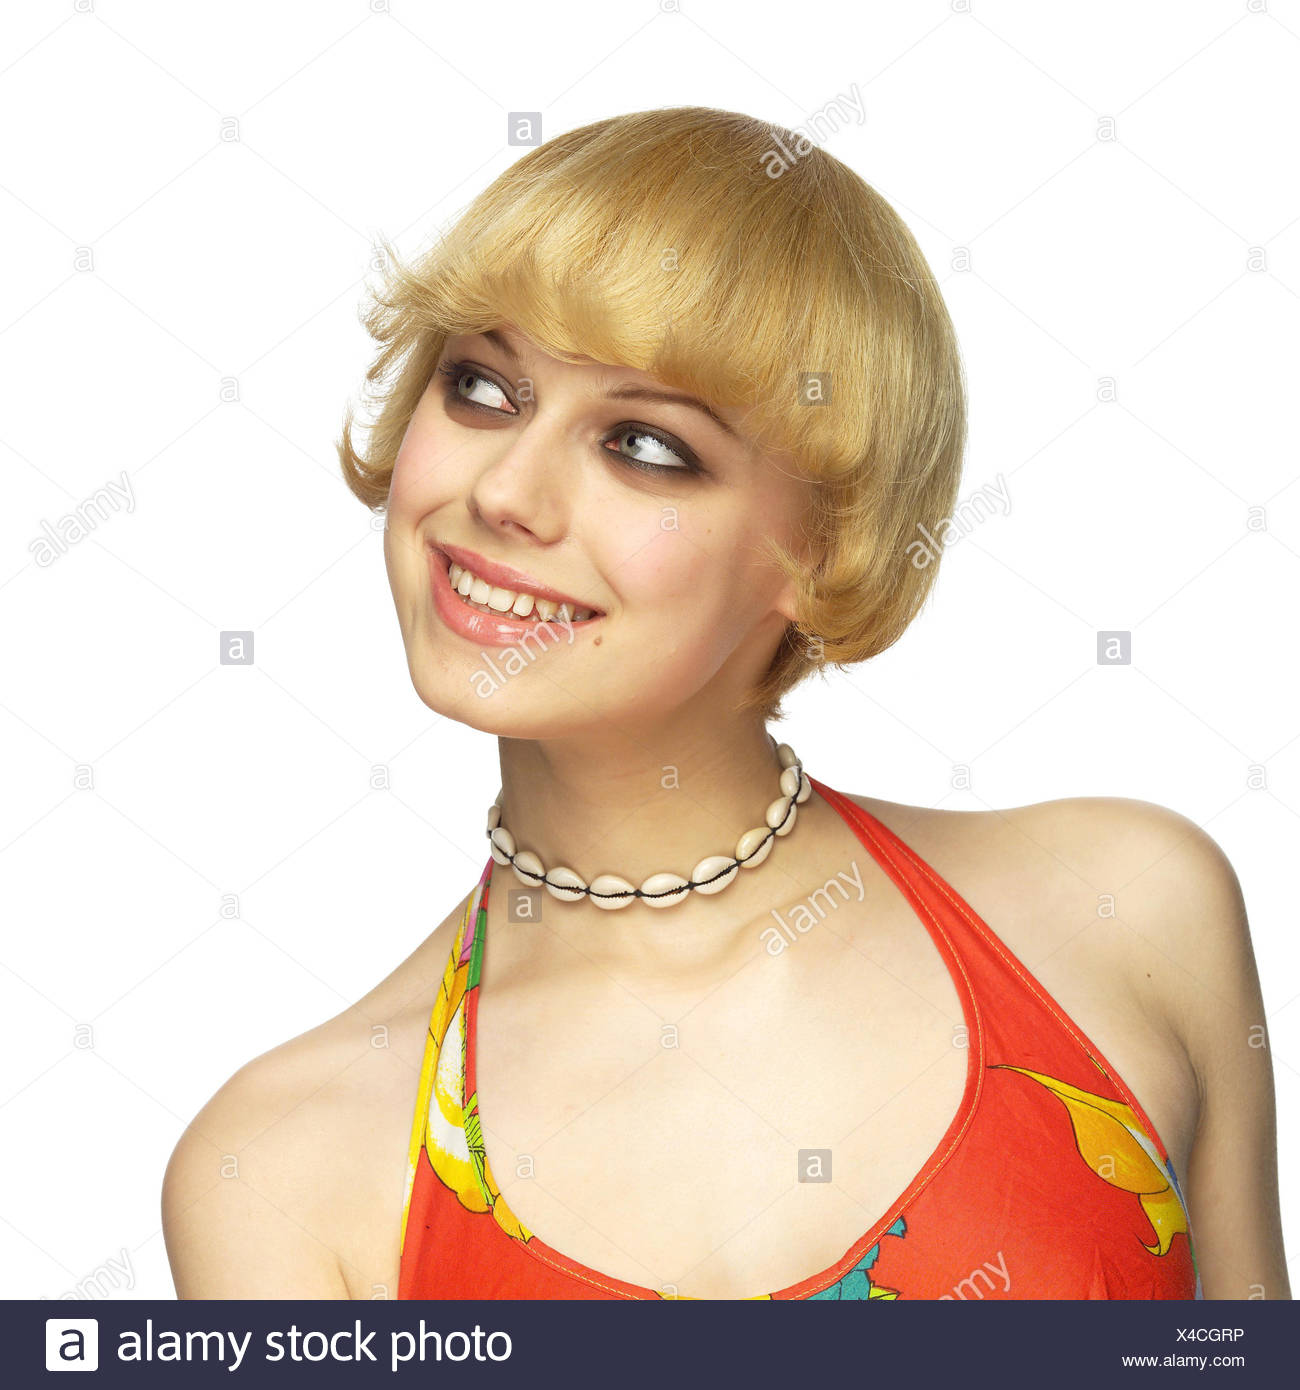 Frau Lächeln Jung Blond Seitenansicht Porträt Frauen